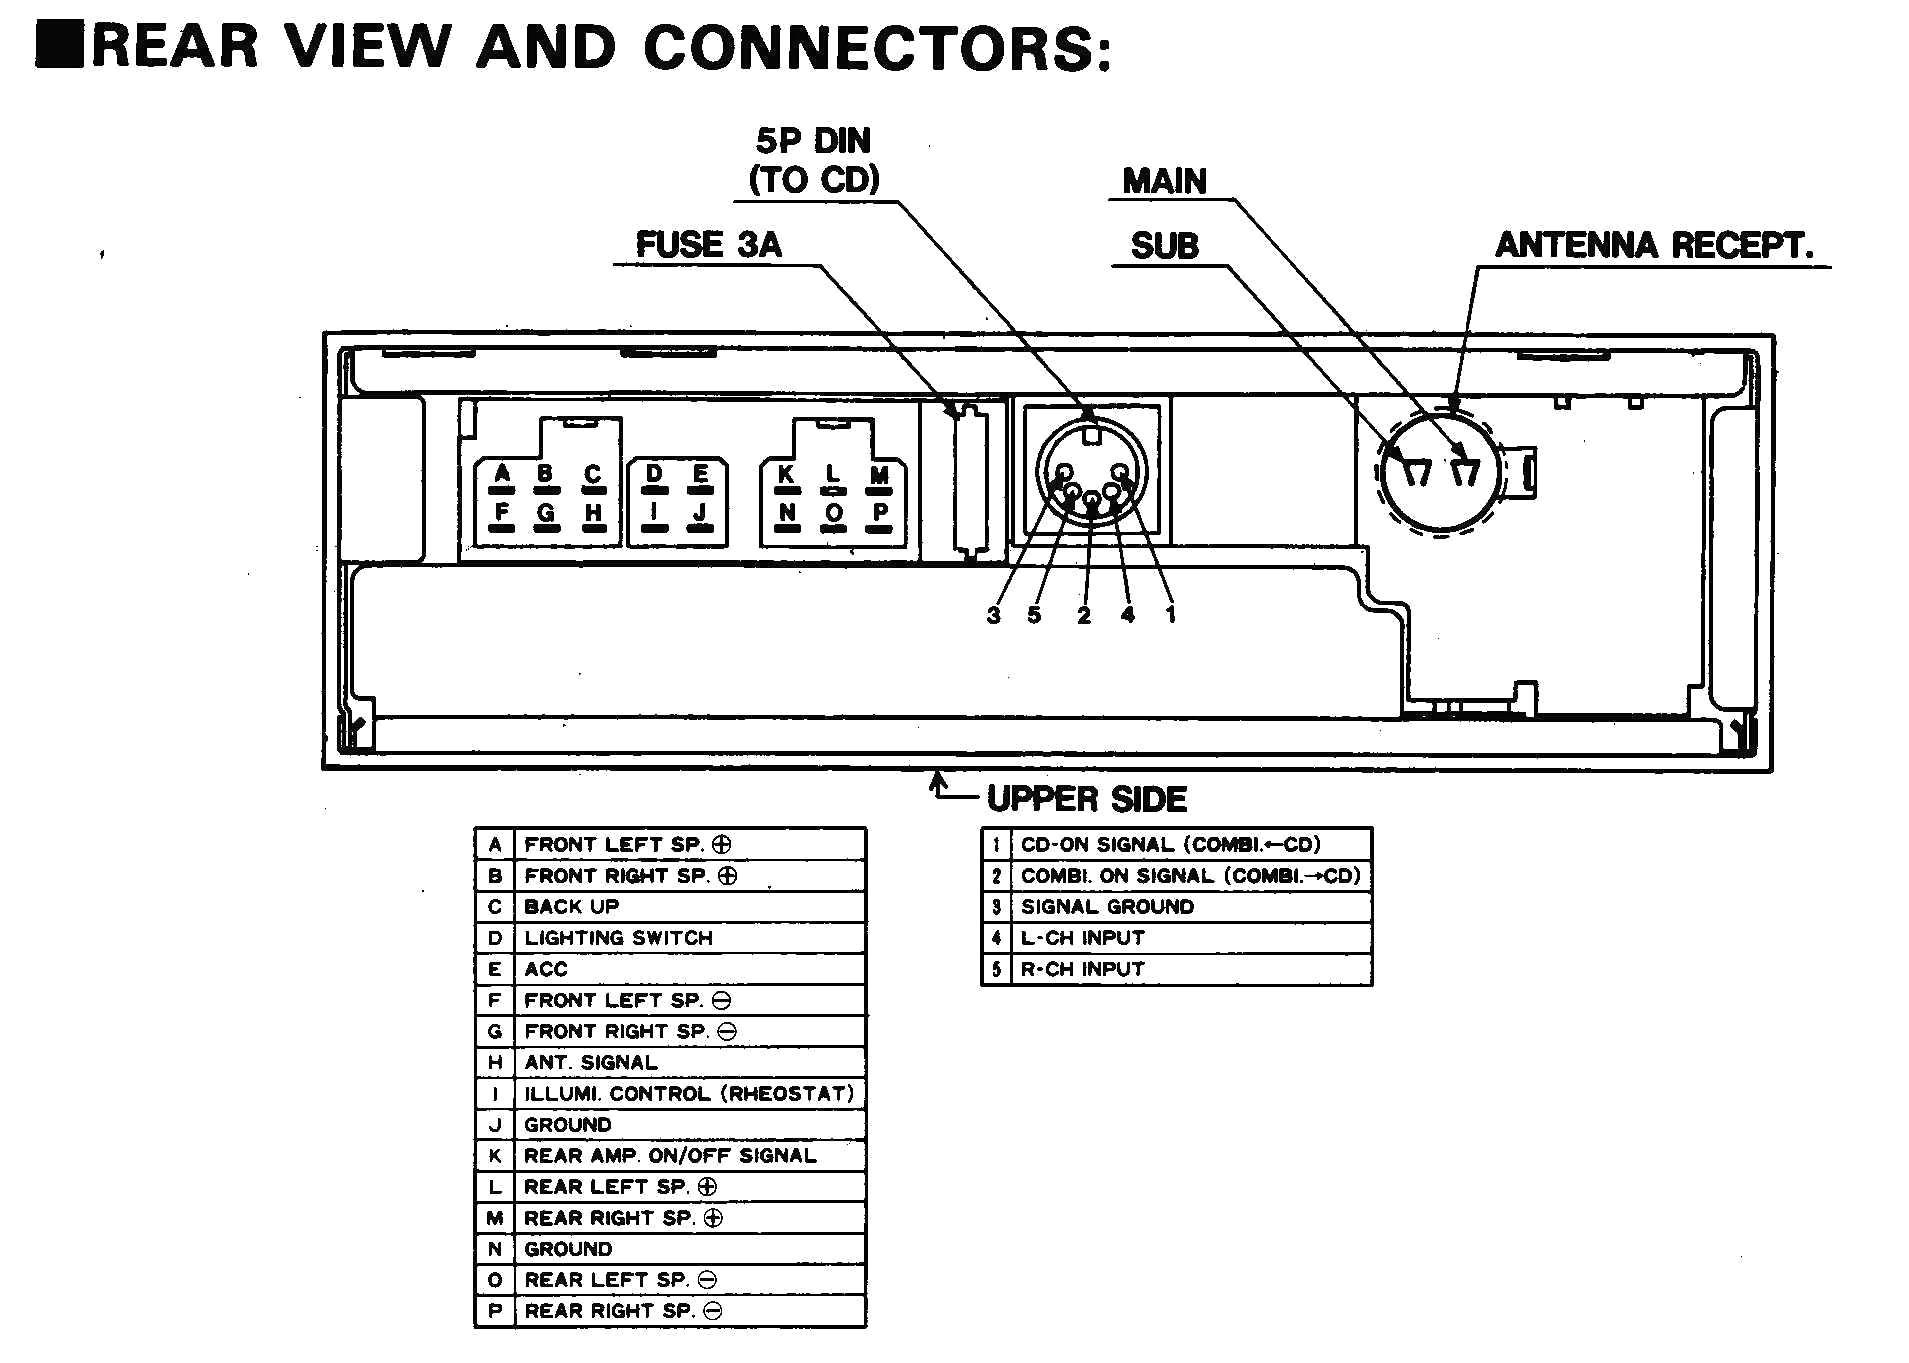 Car Stereo Speaker Wiring Diagram Factory Car Stereo Wiring Diagrams In Jpg Striking Speaker Diagram Of Car Stereo Speaker Wiring Diagram